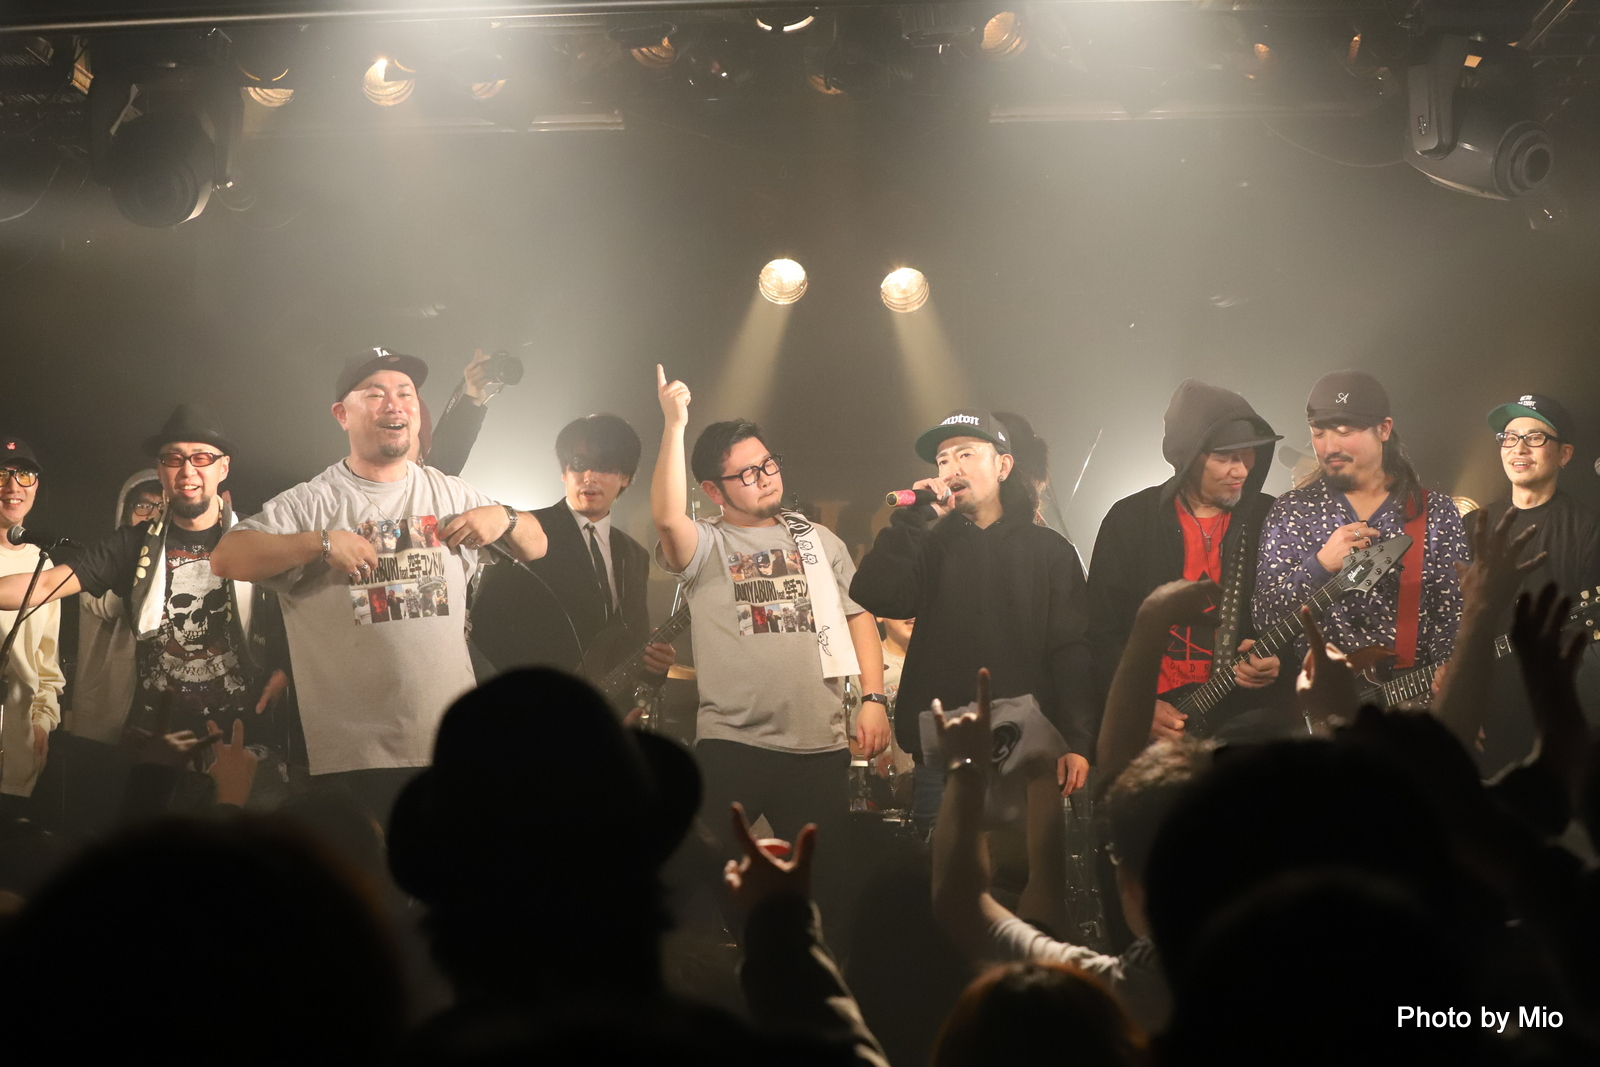 [Photo] 2019/1/26 [道場破り Vol.18] @渋谷CYCLONE